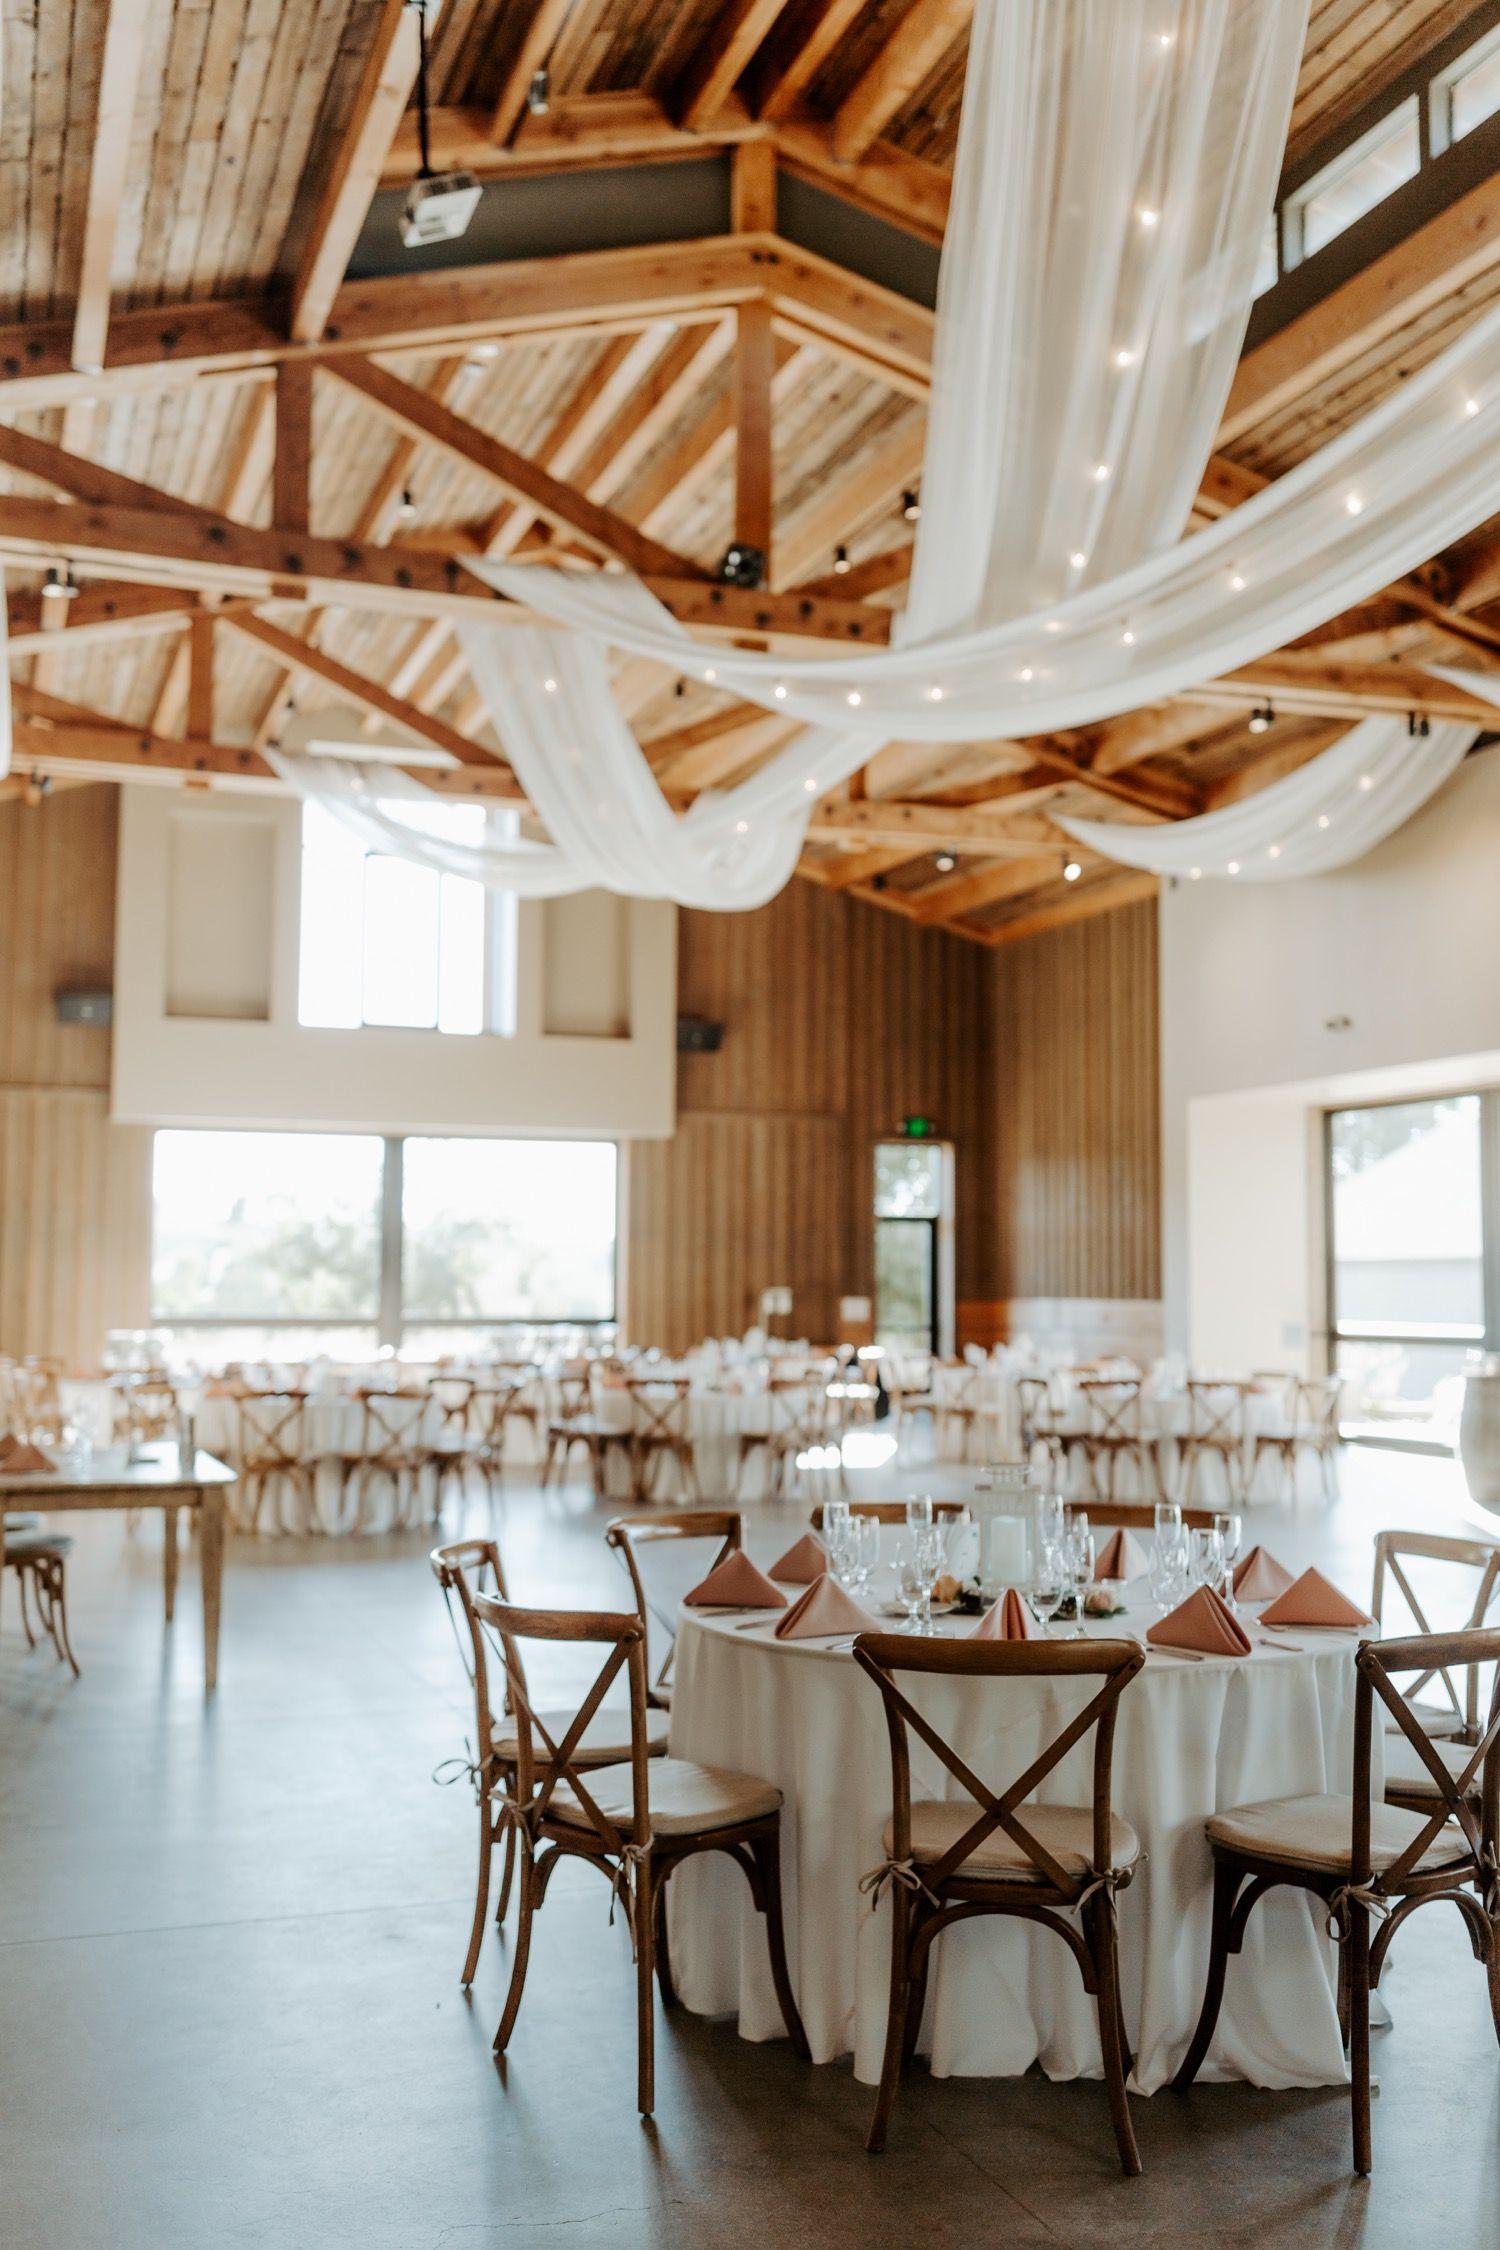 temecula wedding Temecula weddings, Rustic country